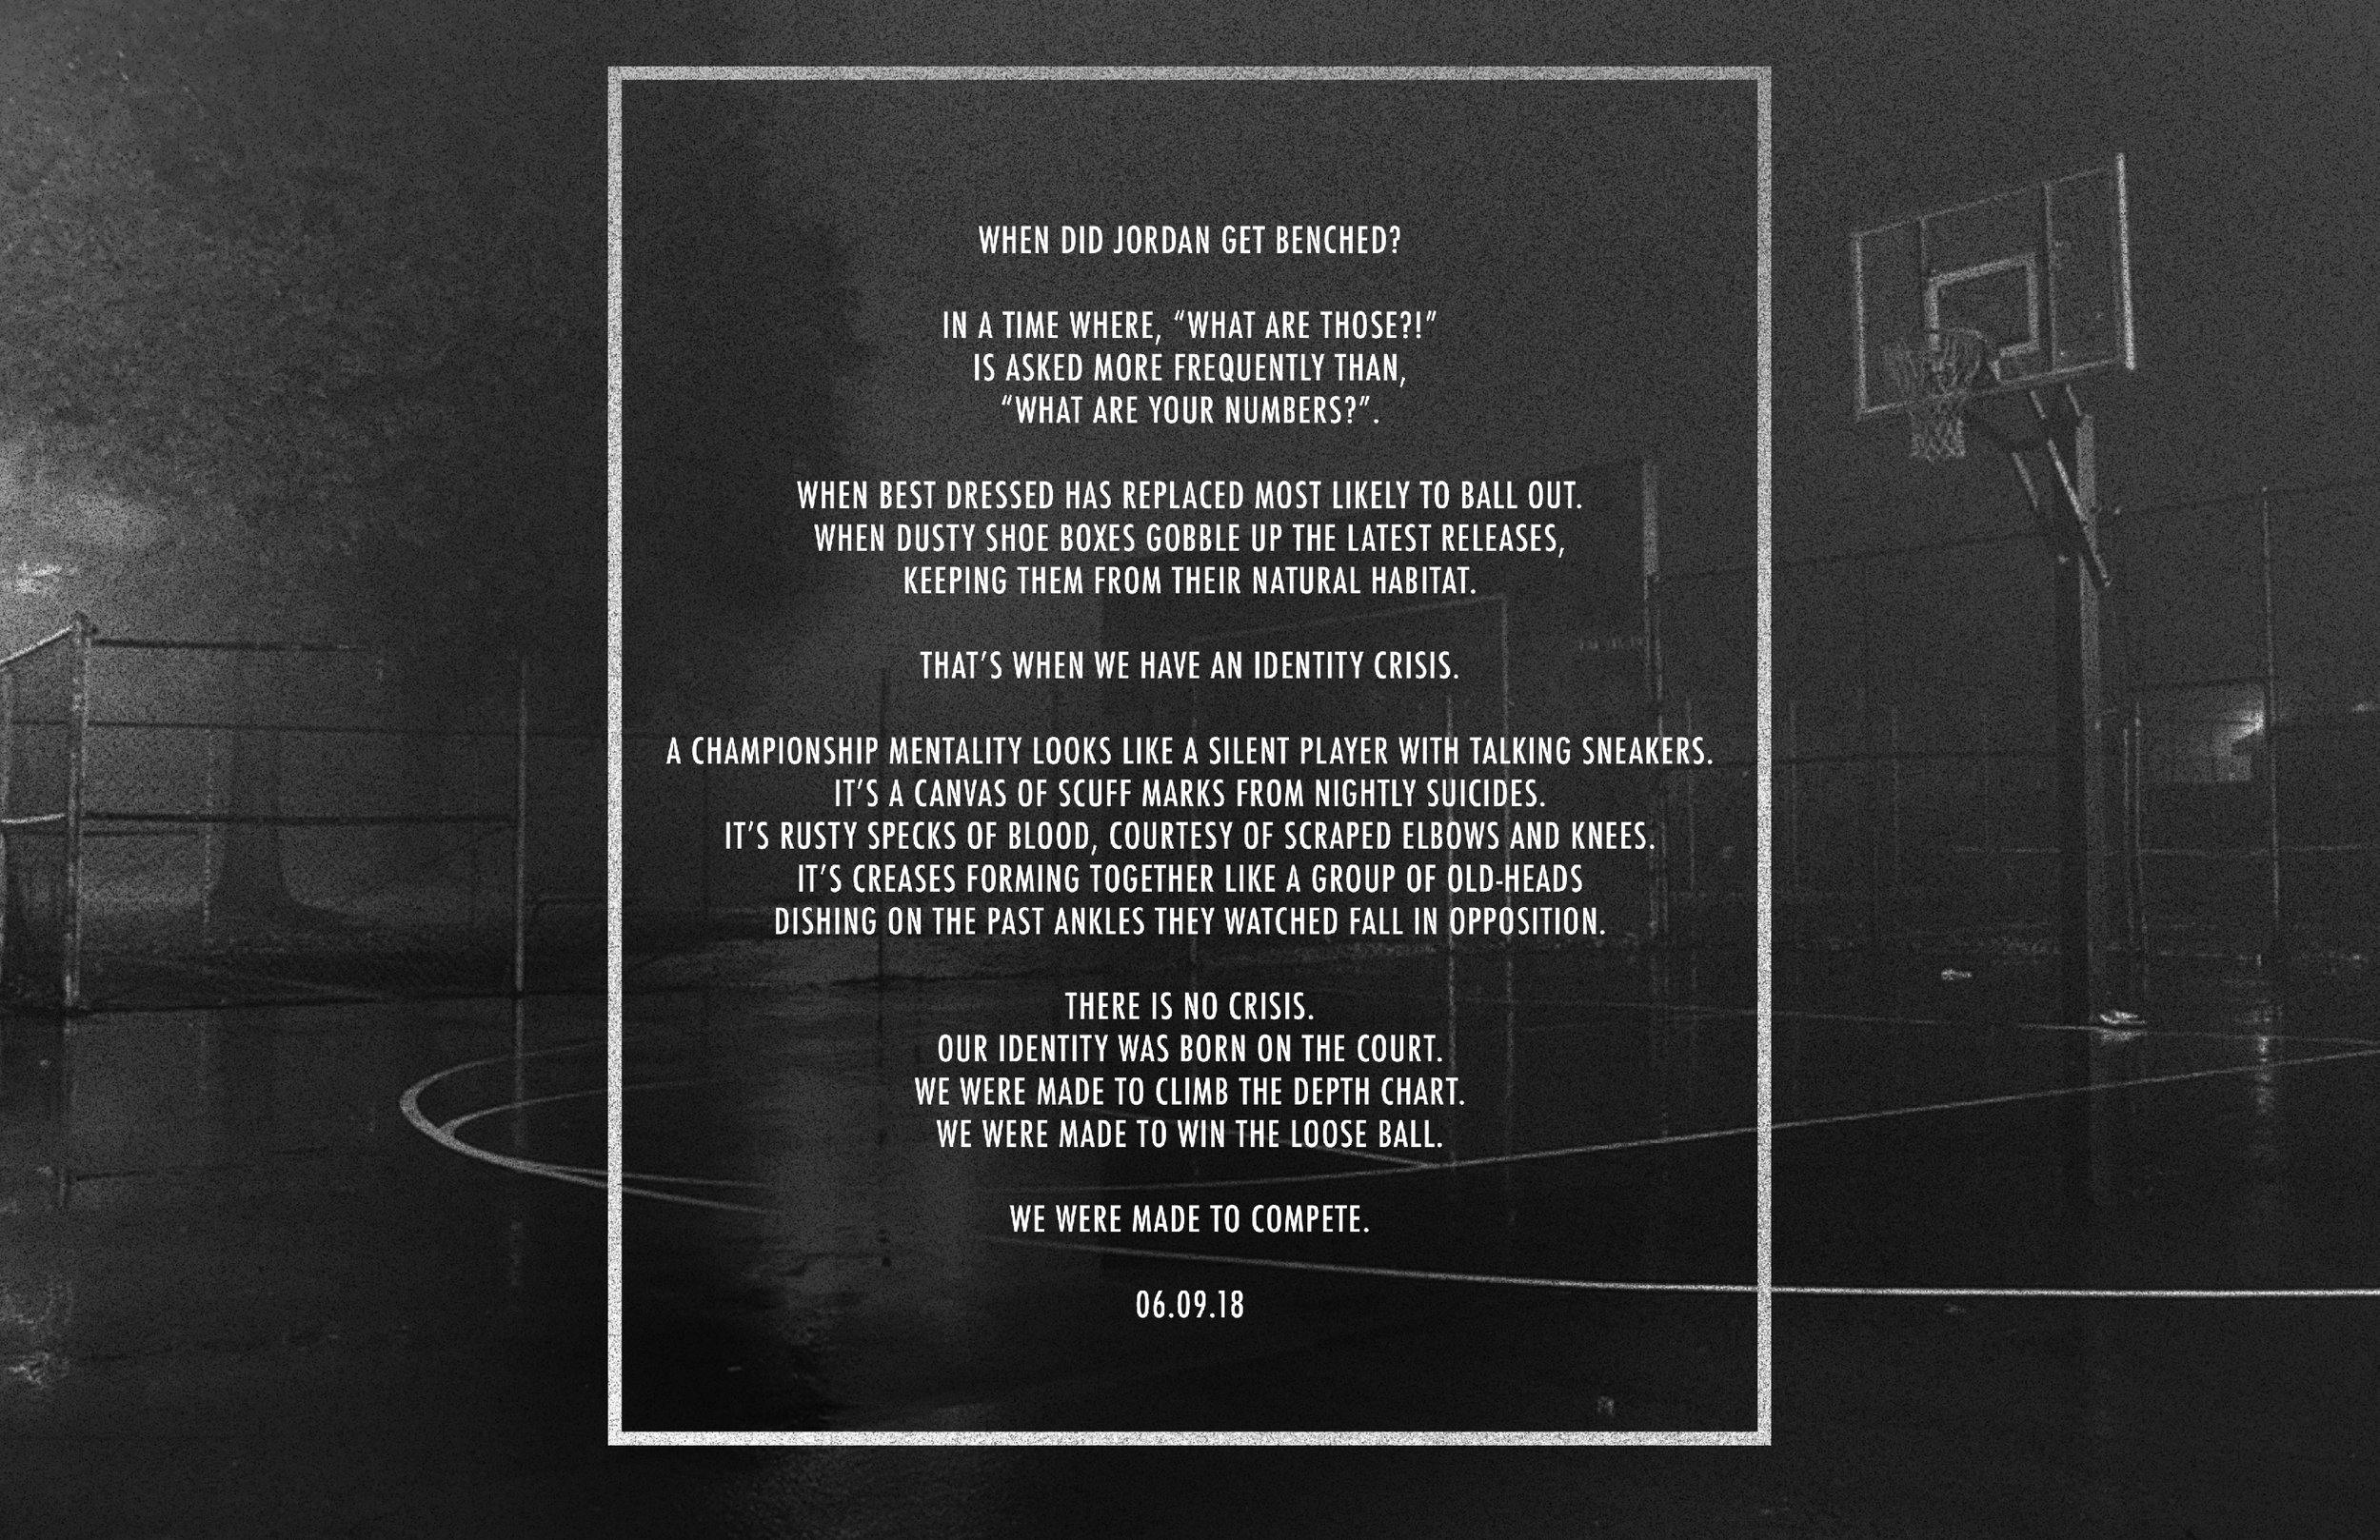 Jordan Manifesto.png